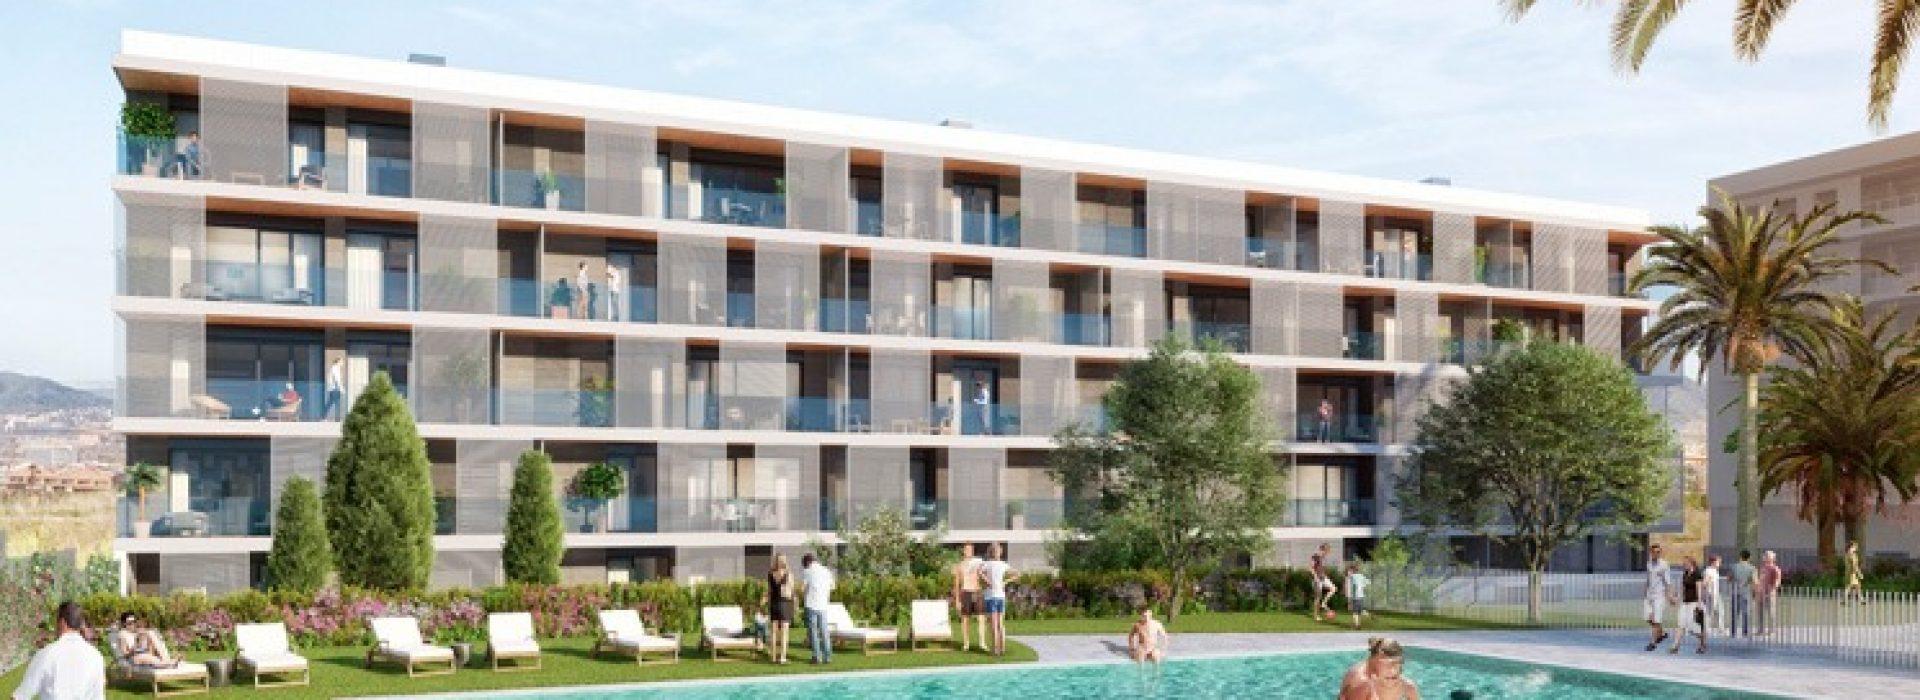 residencial-mirador-mas-llui02